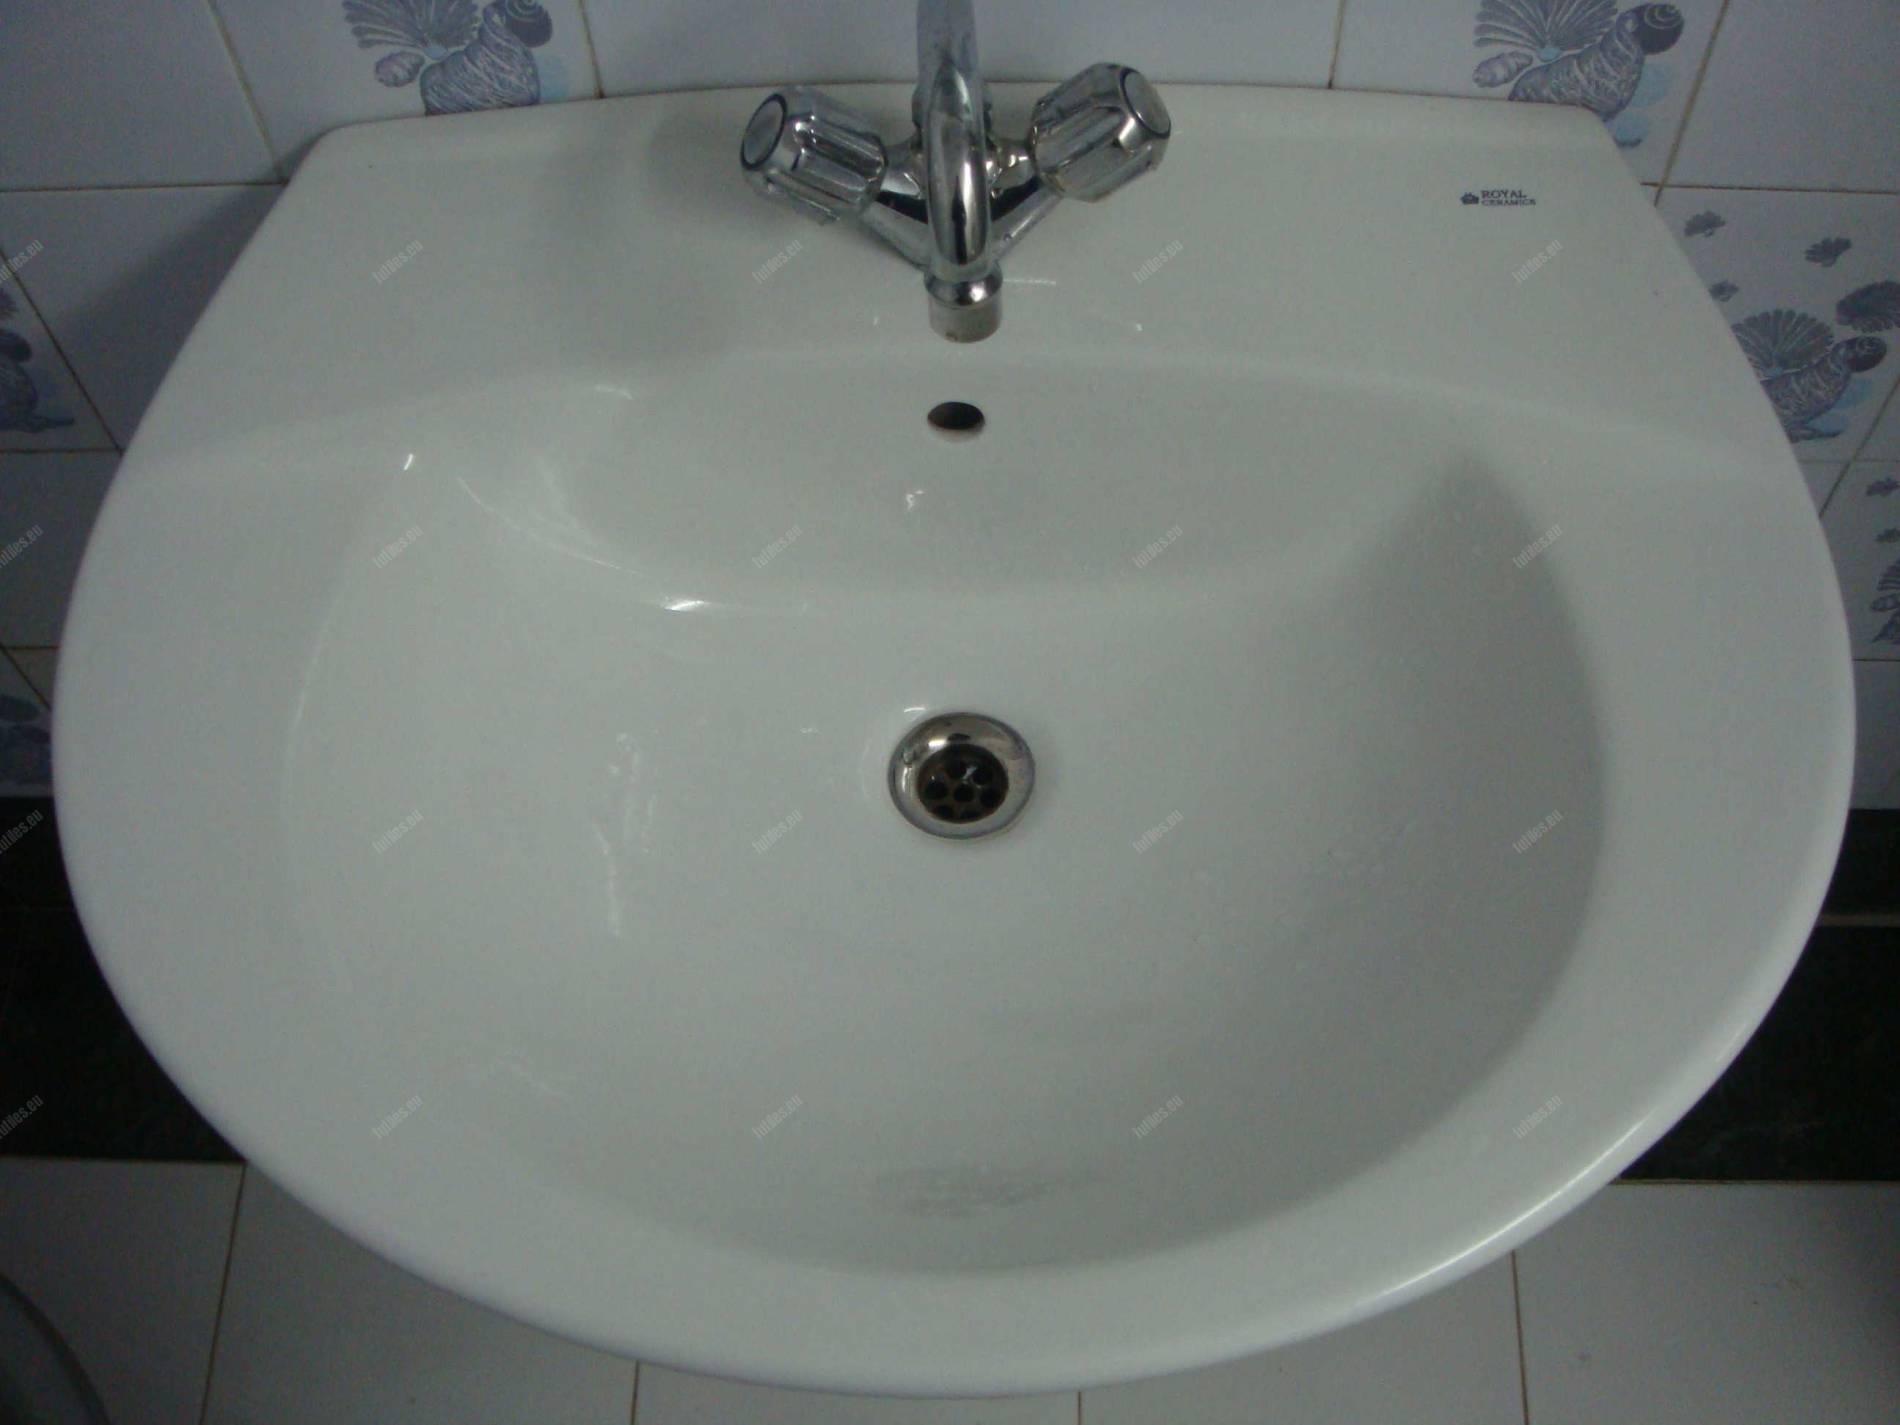 clean-sink112581